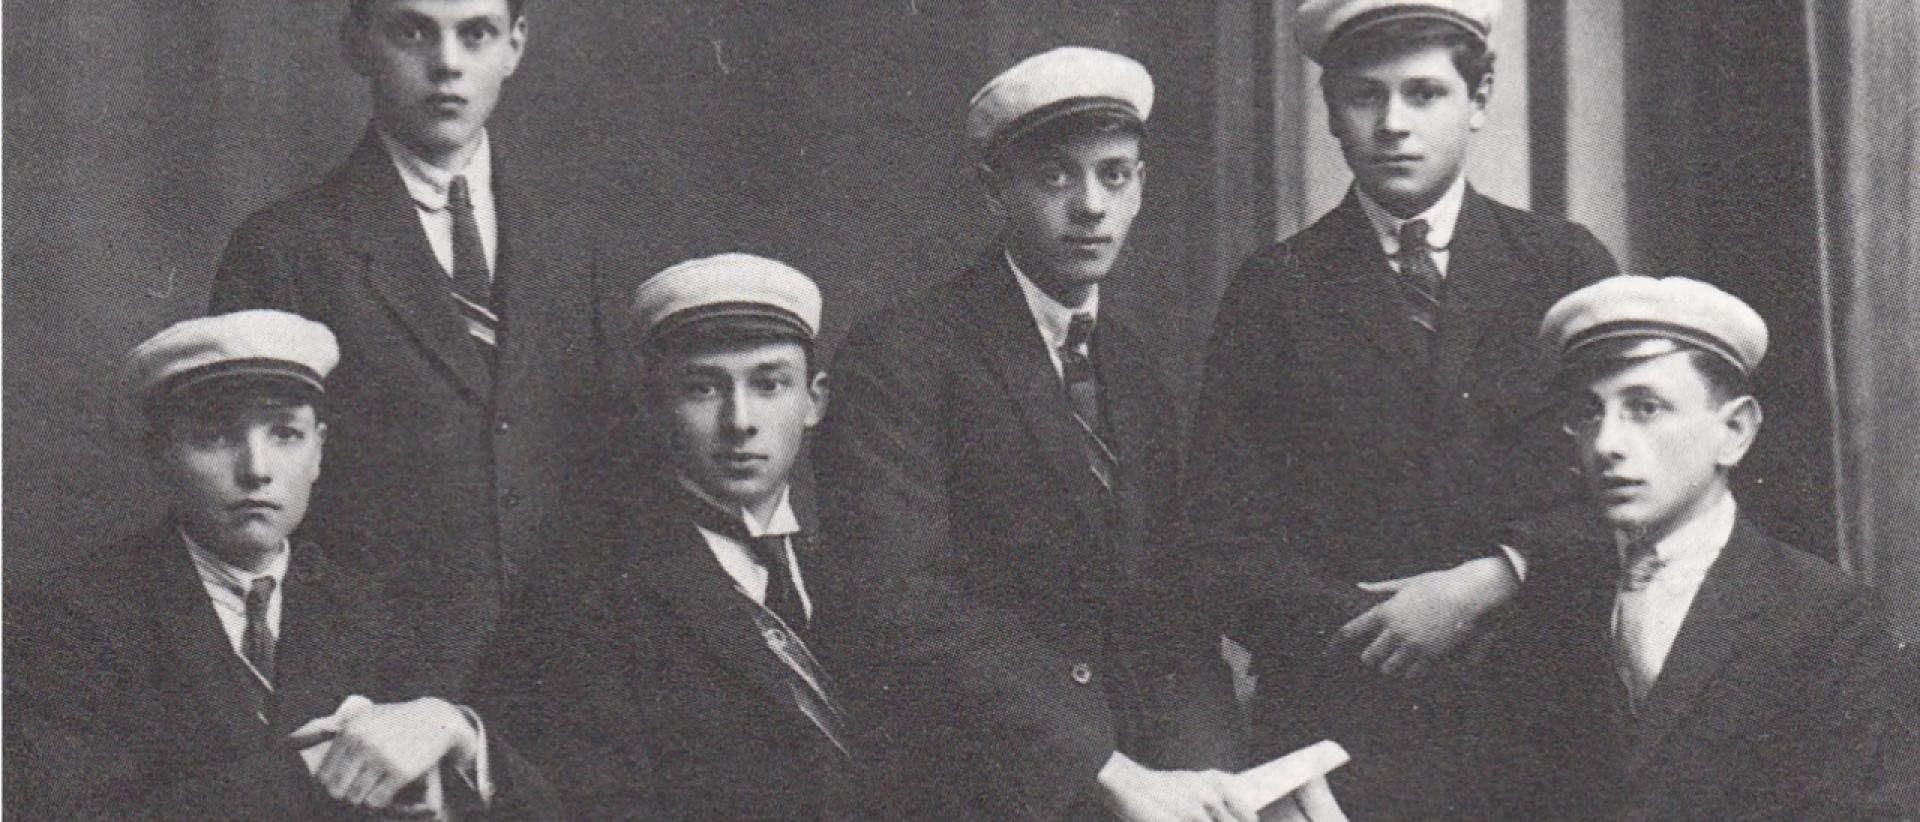 Schülerverbindung Saxonia Czernowitz (1922)